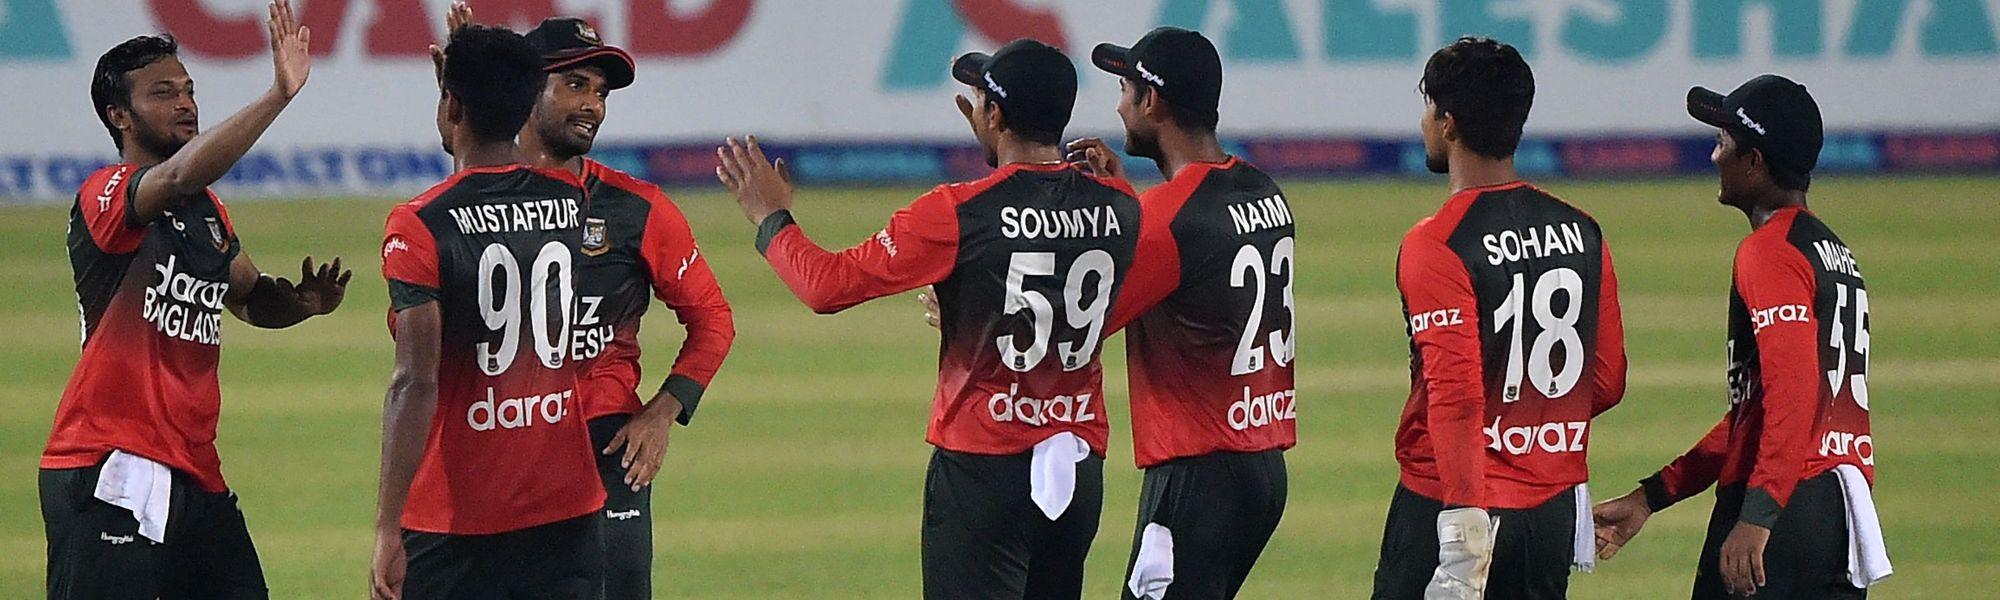 Bangladesh win first T20I against Australia